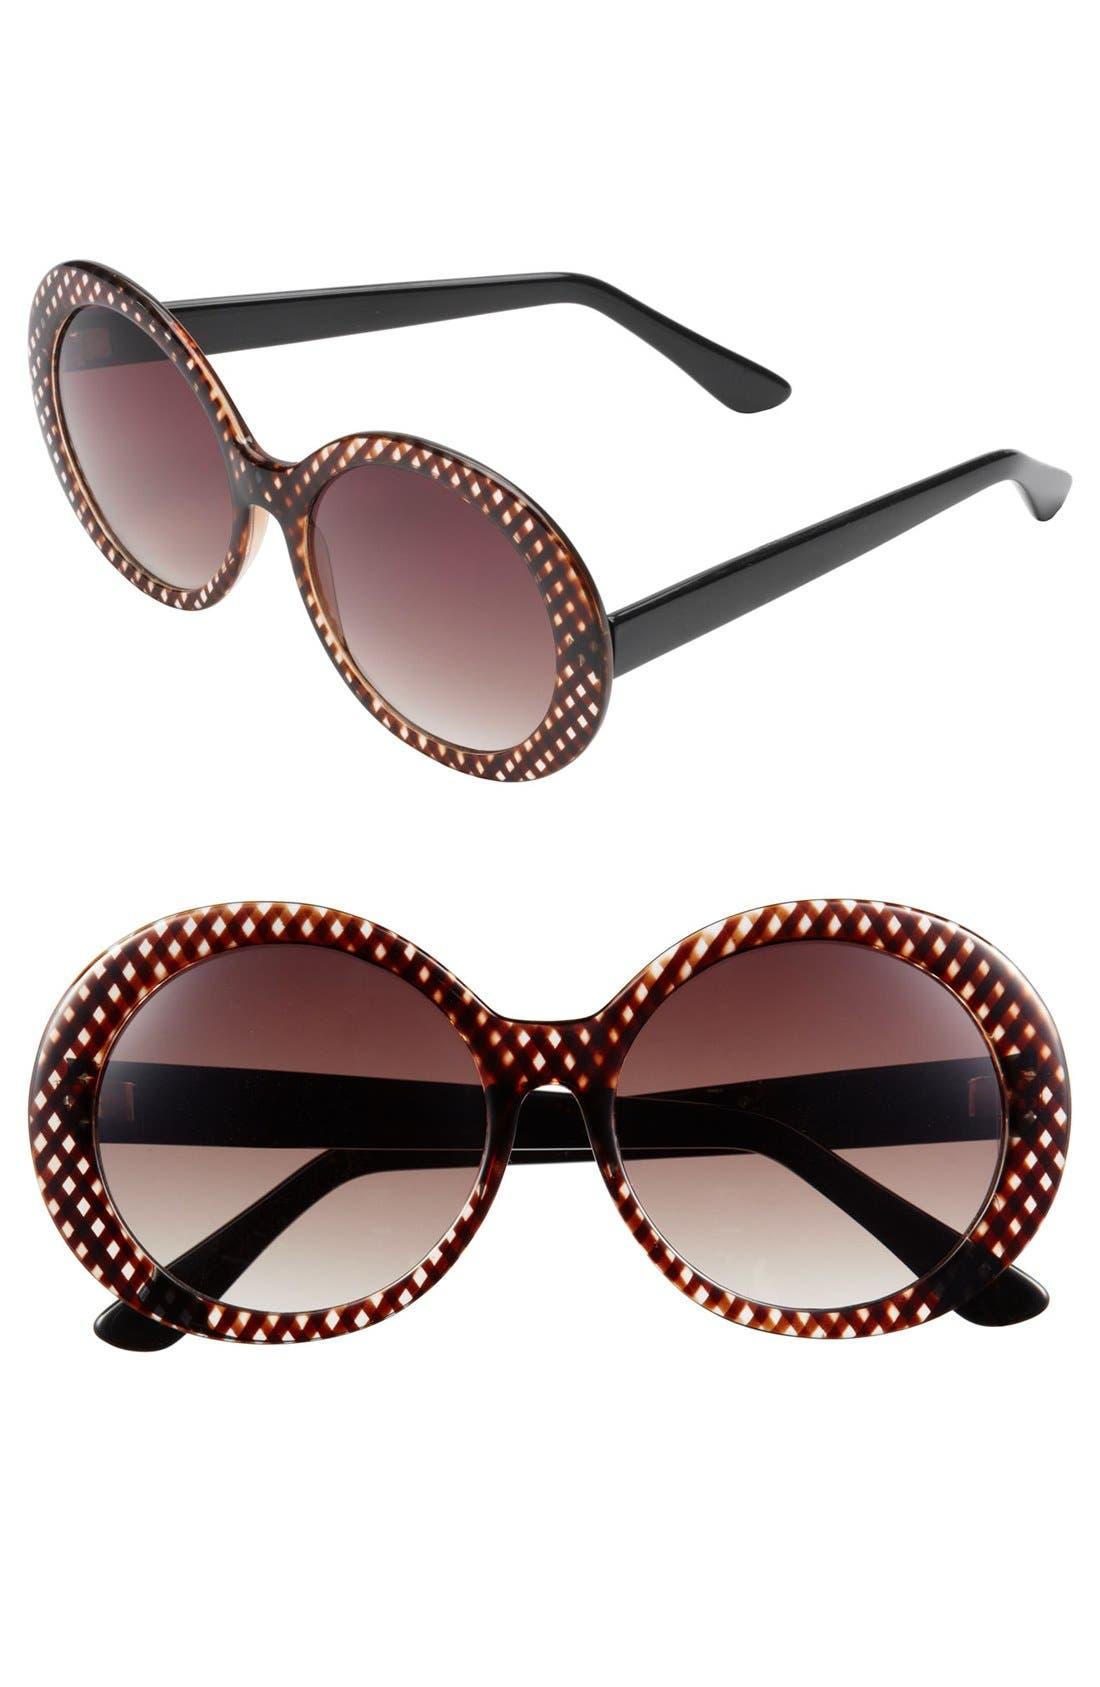 Alternate Image 1 Selected - Outlook Eyewear 'La Jolla' Sunglasses